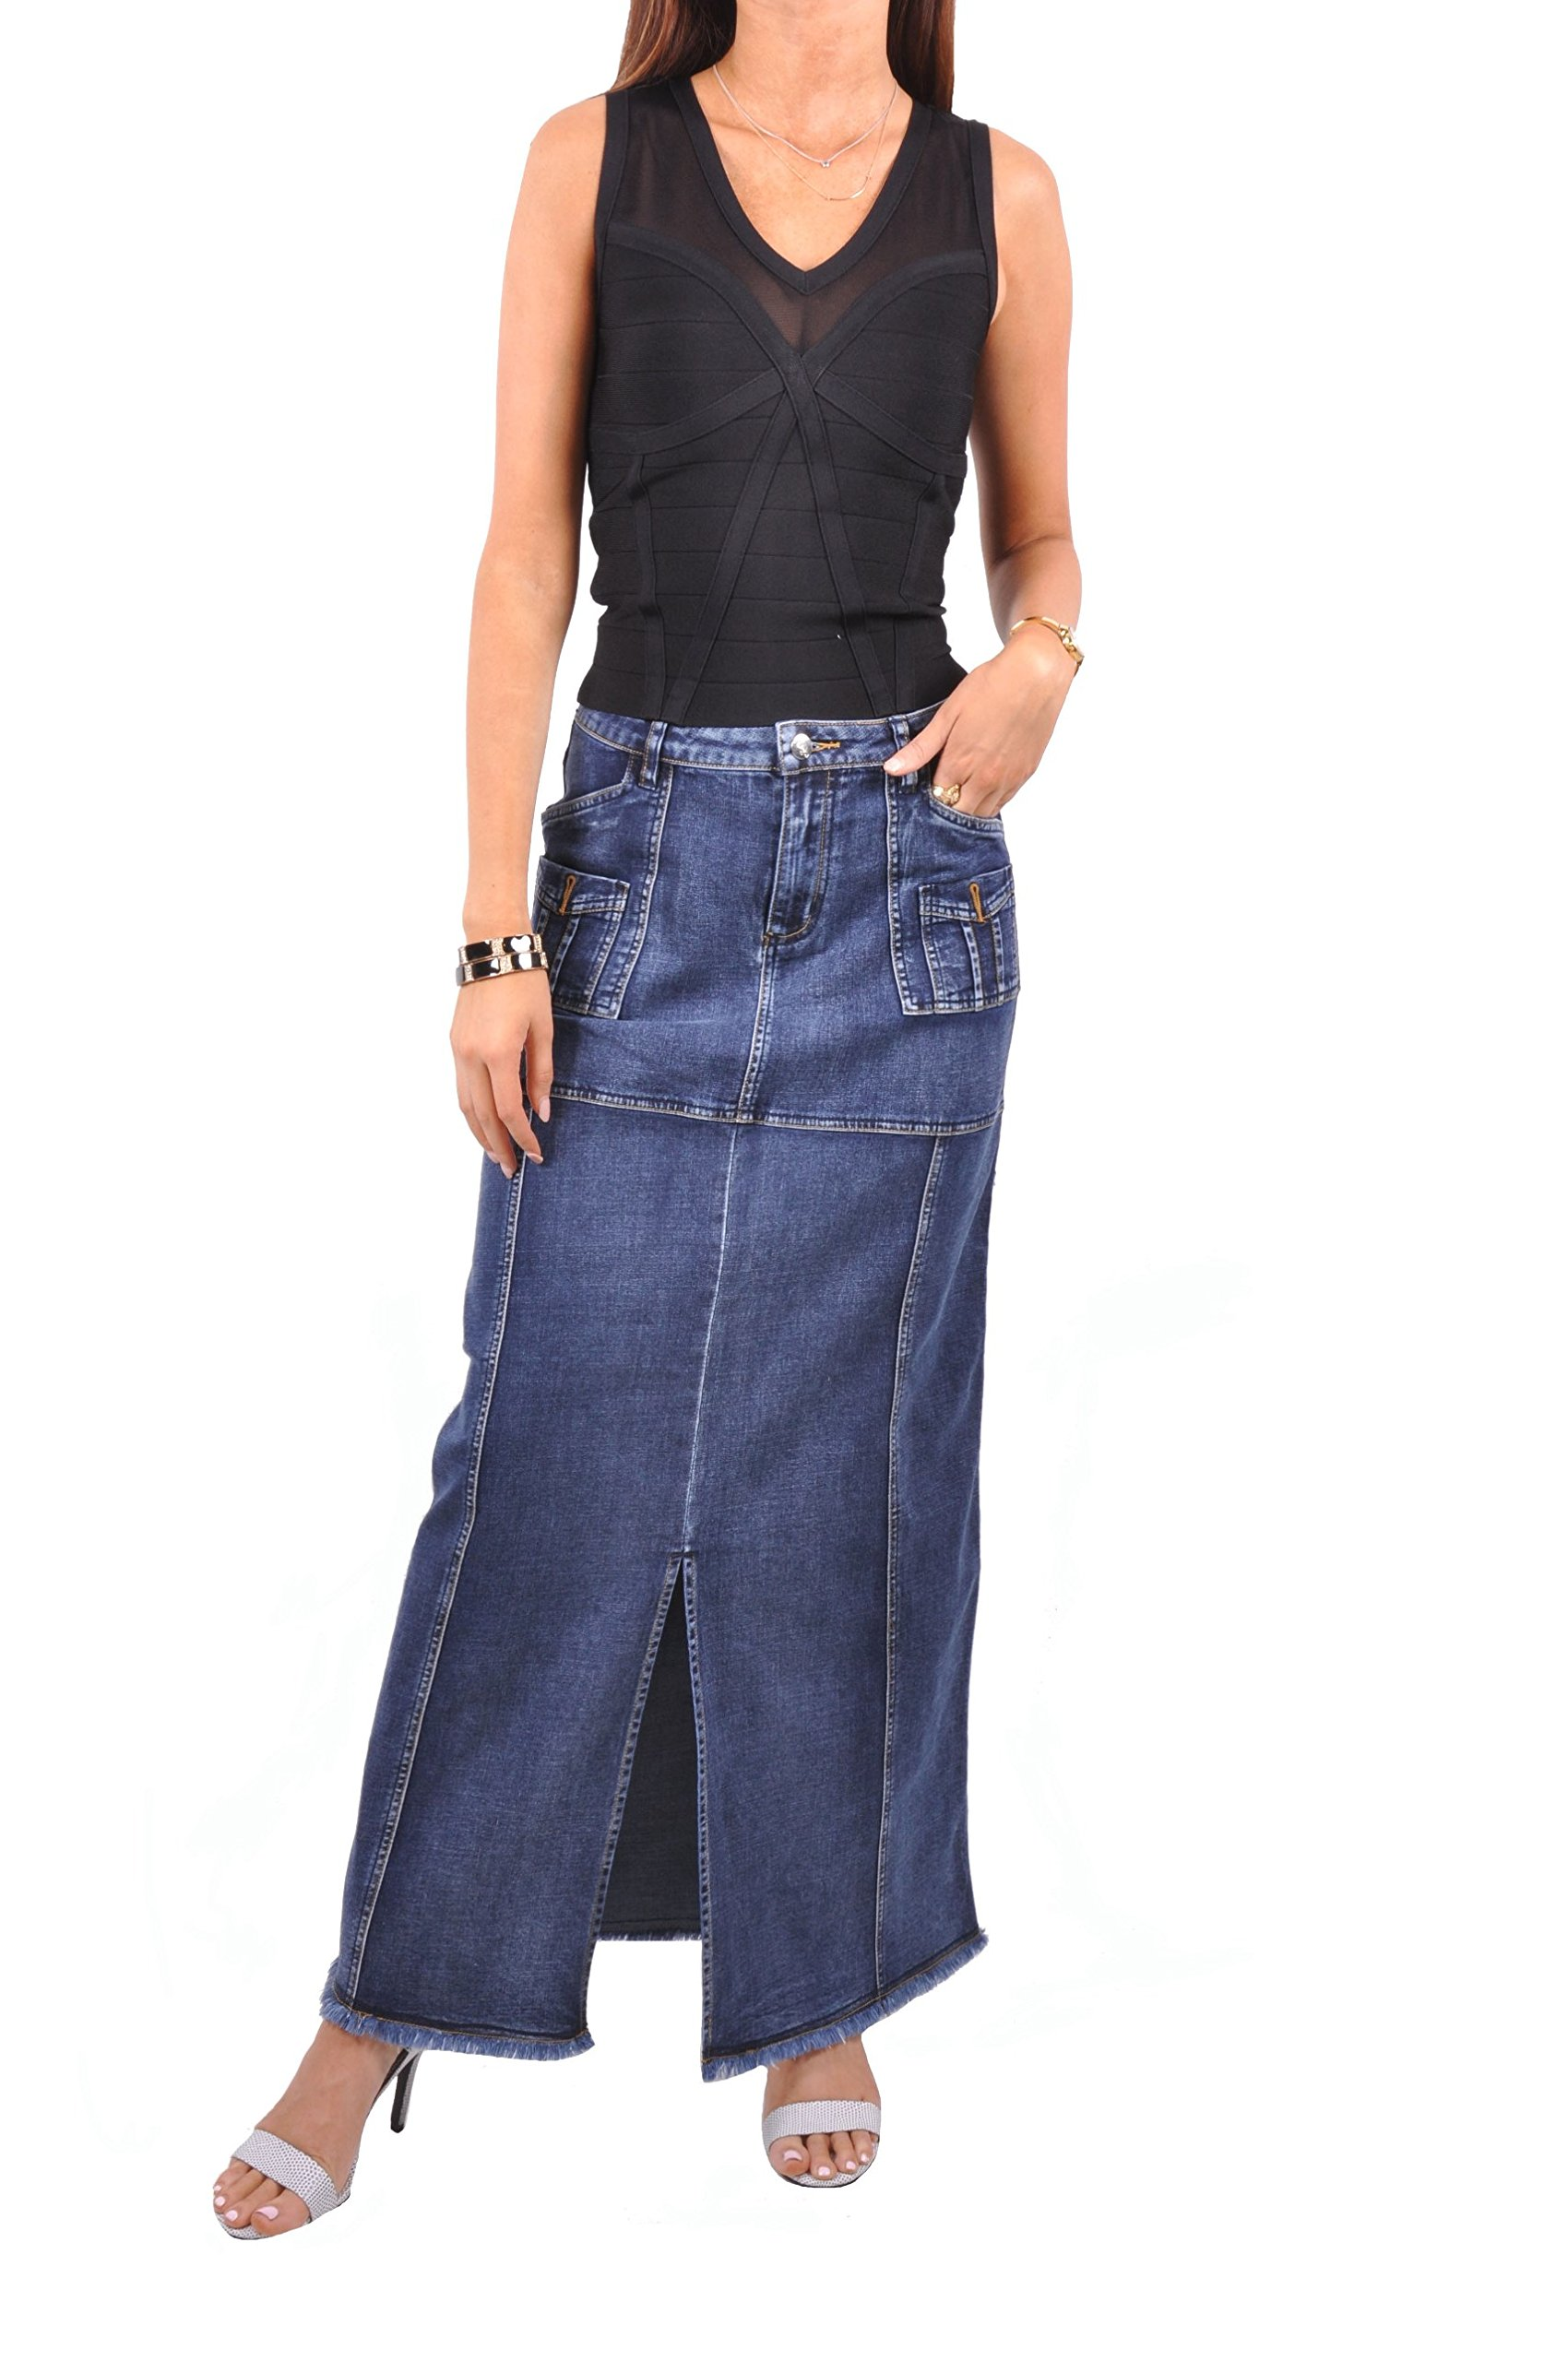 Style J Brushed Blue Denim Skirt-Brushed Blue-32(12) by Style J